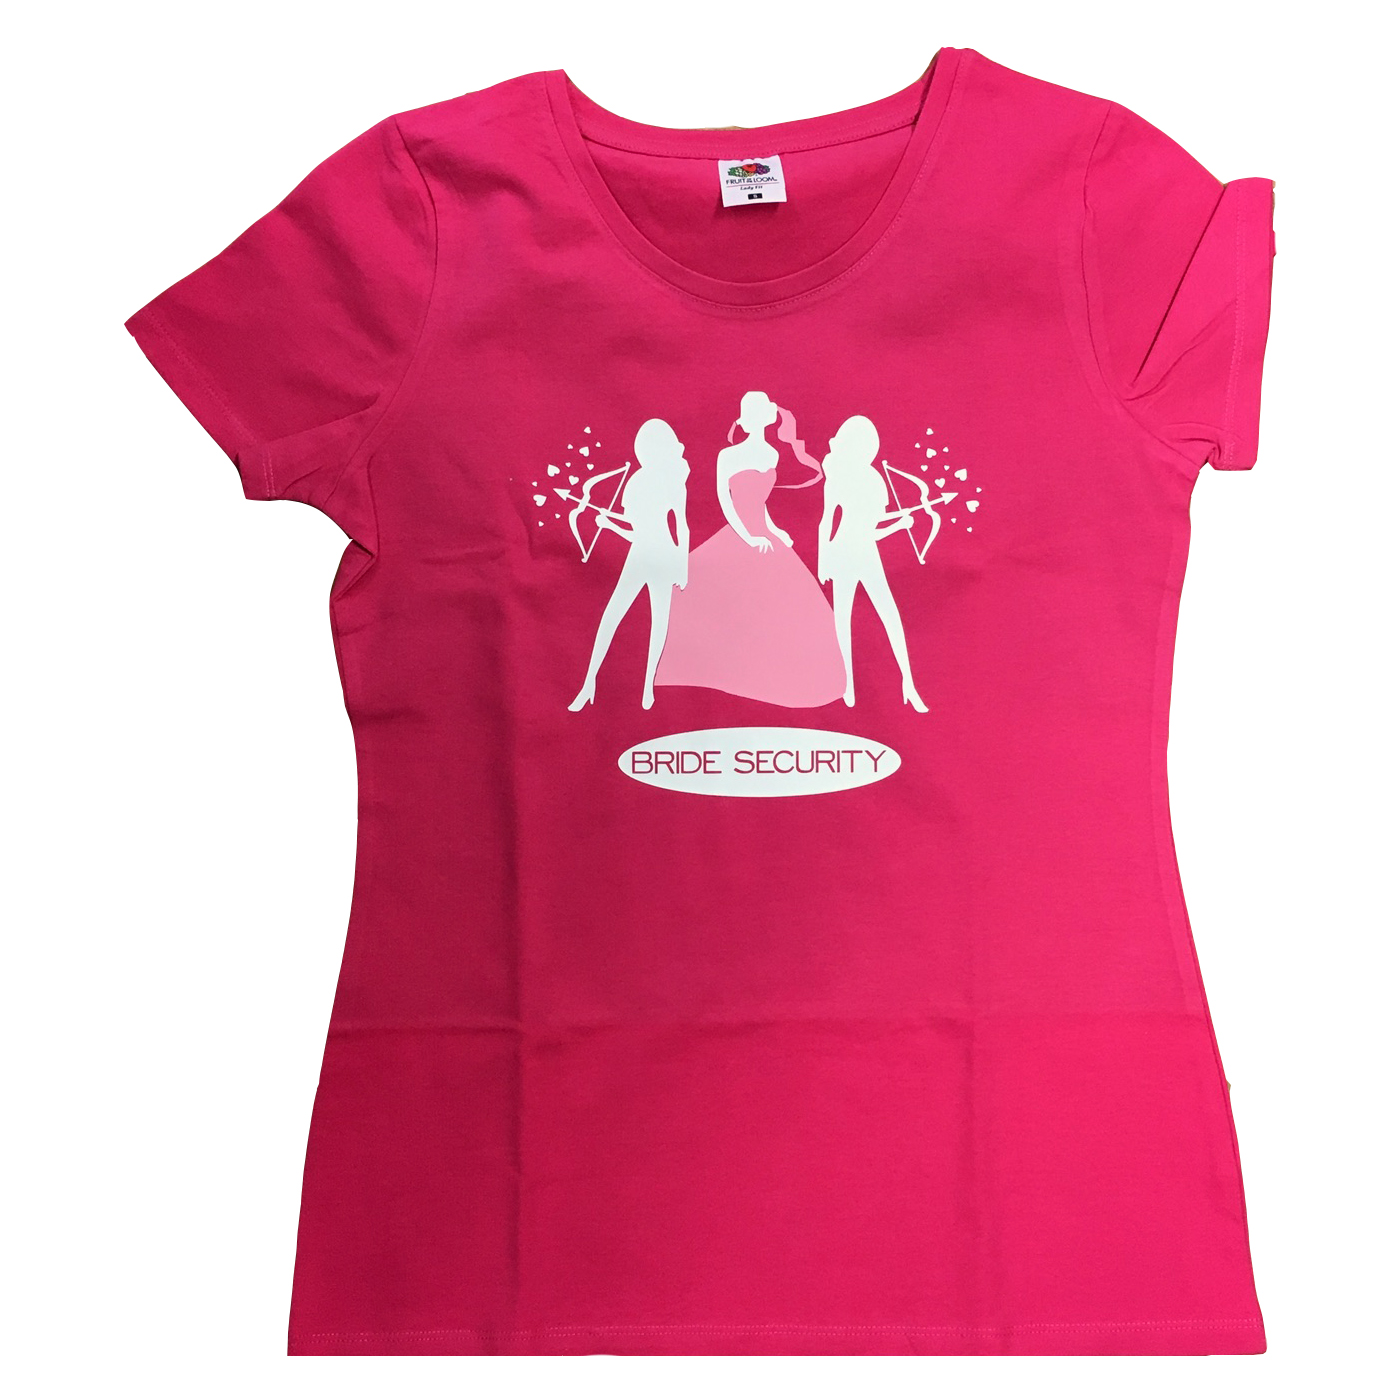 Bride security t shirt hen party t shirts forever memories for Hen party t shirts